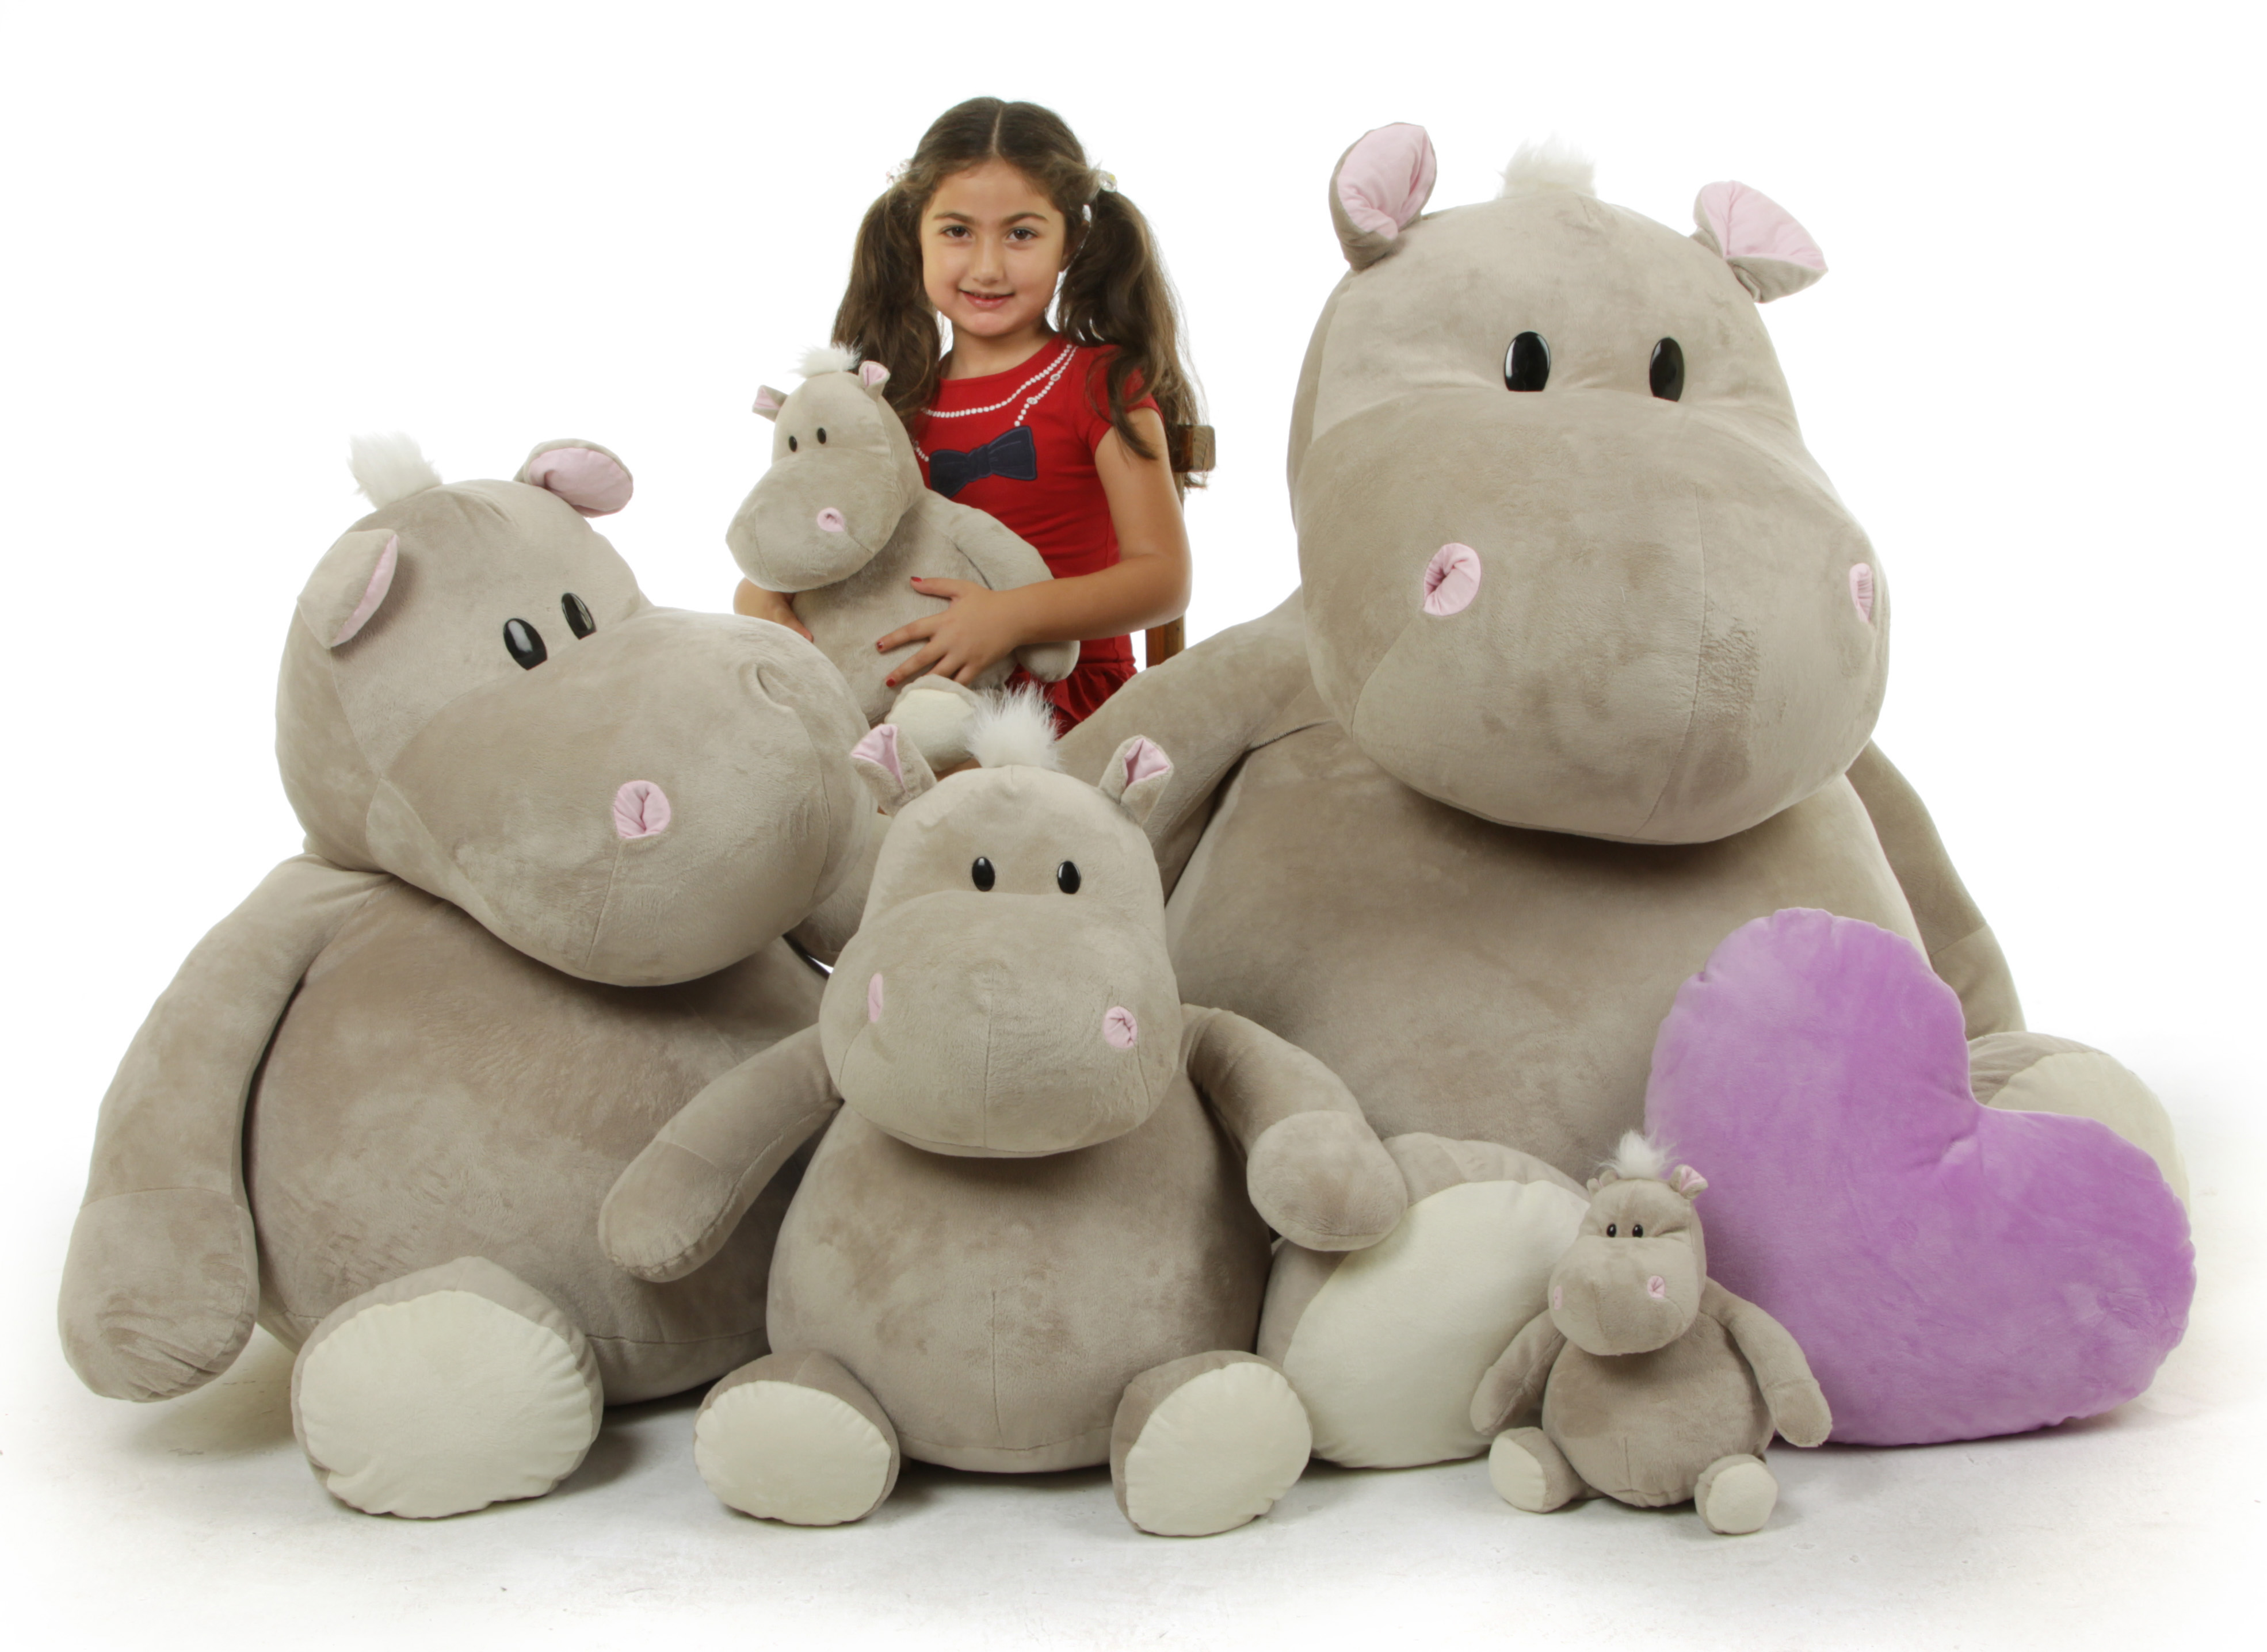 5 giant stuffed hippo